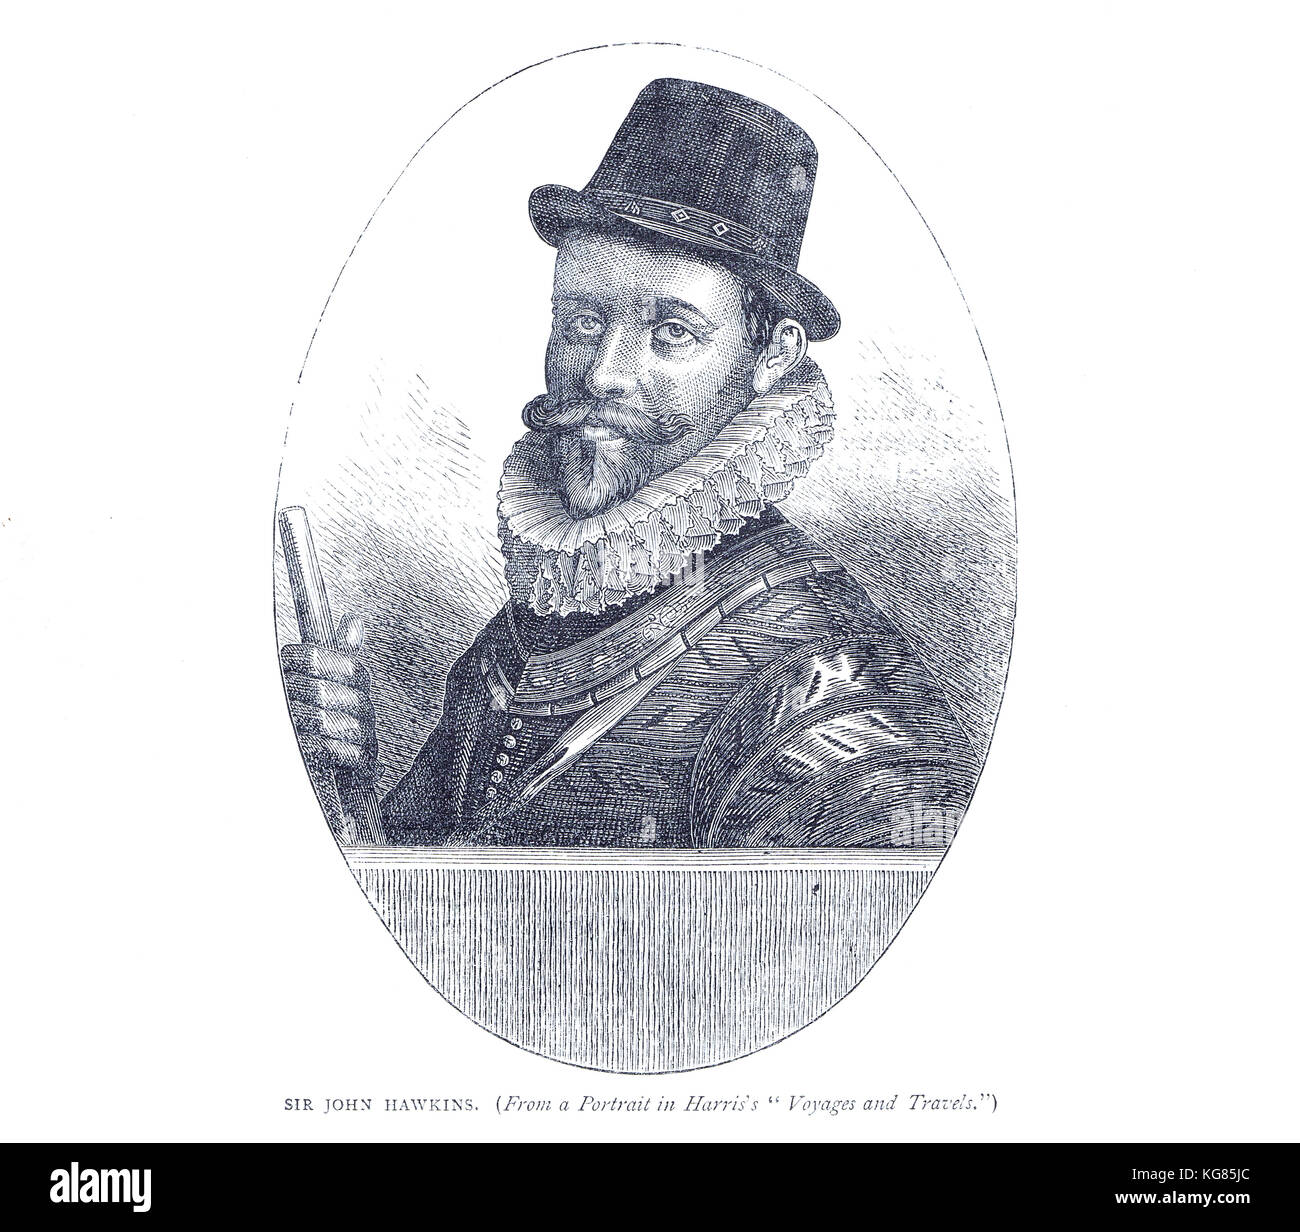 Admiral Sir John Hawkins, 1532-1595,  English slave trader, naval commander and administrator, merchant, navigator, - Stock Image